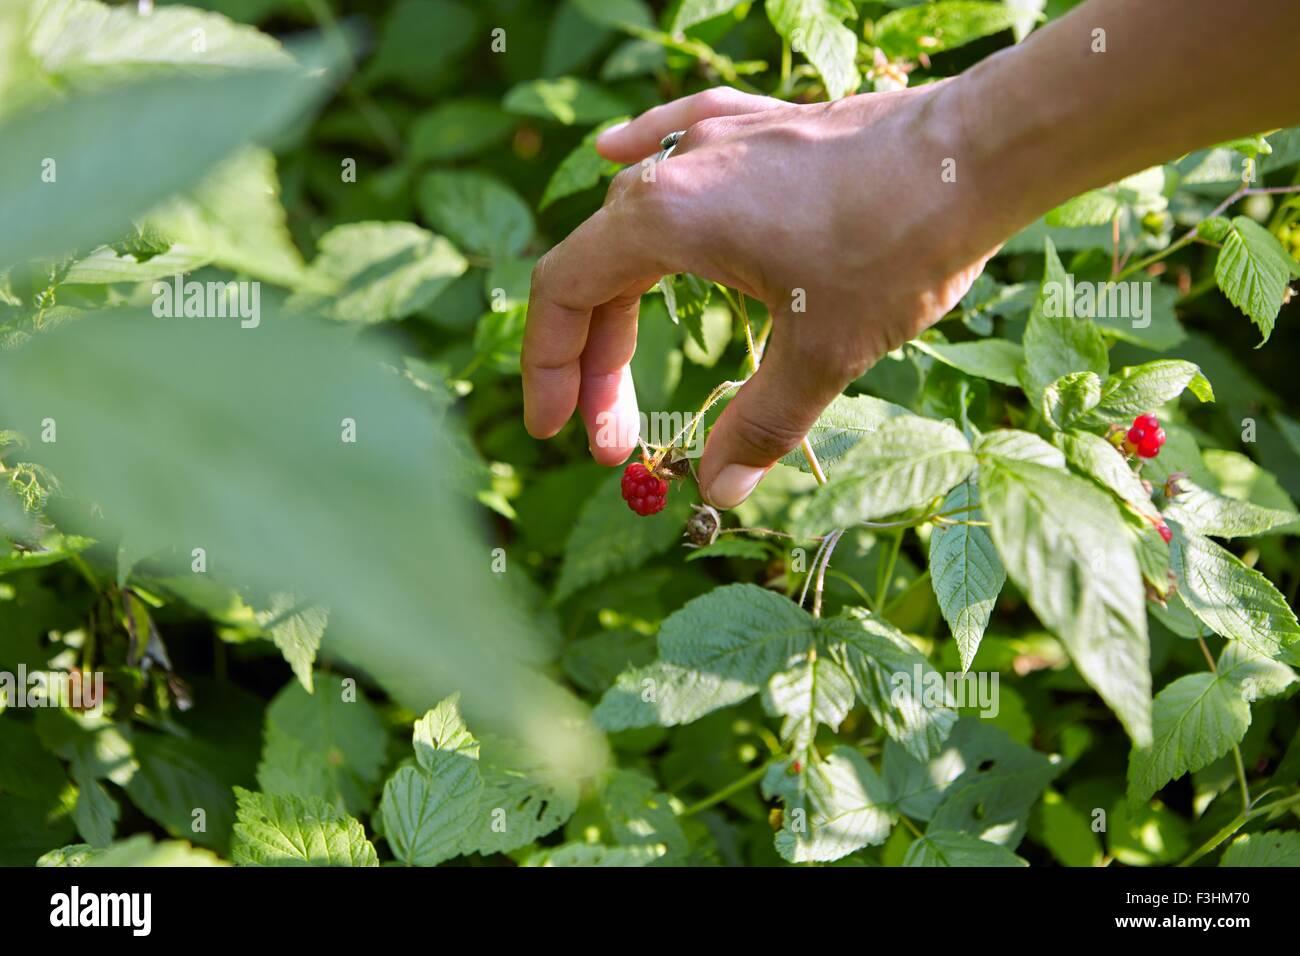 Hand of woman picking raspberry - Stock Image